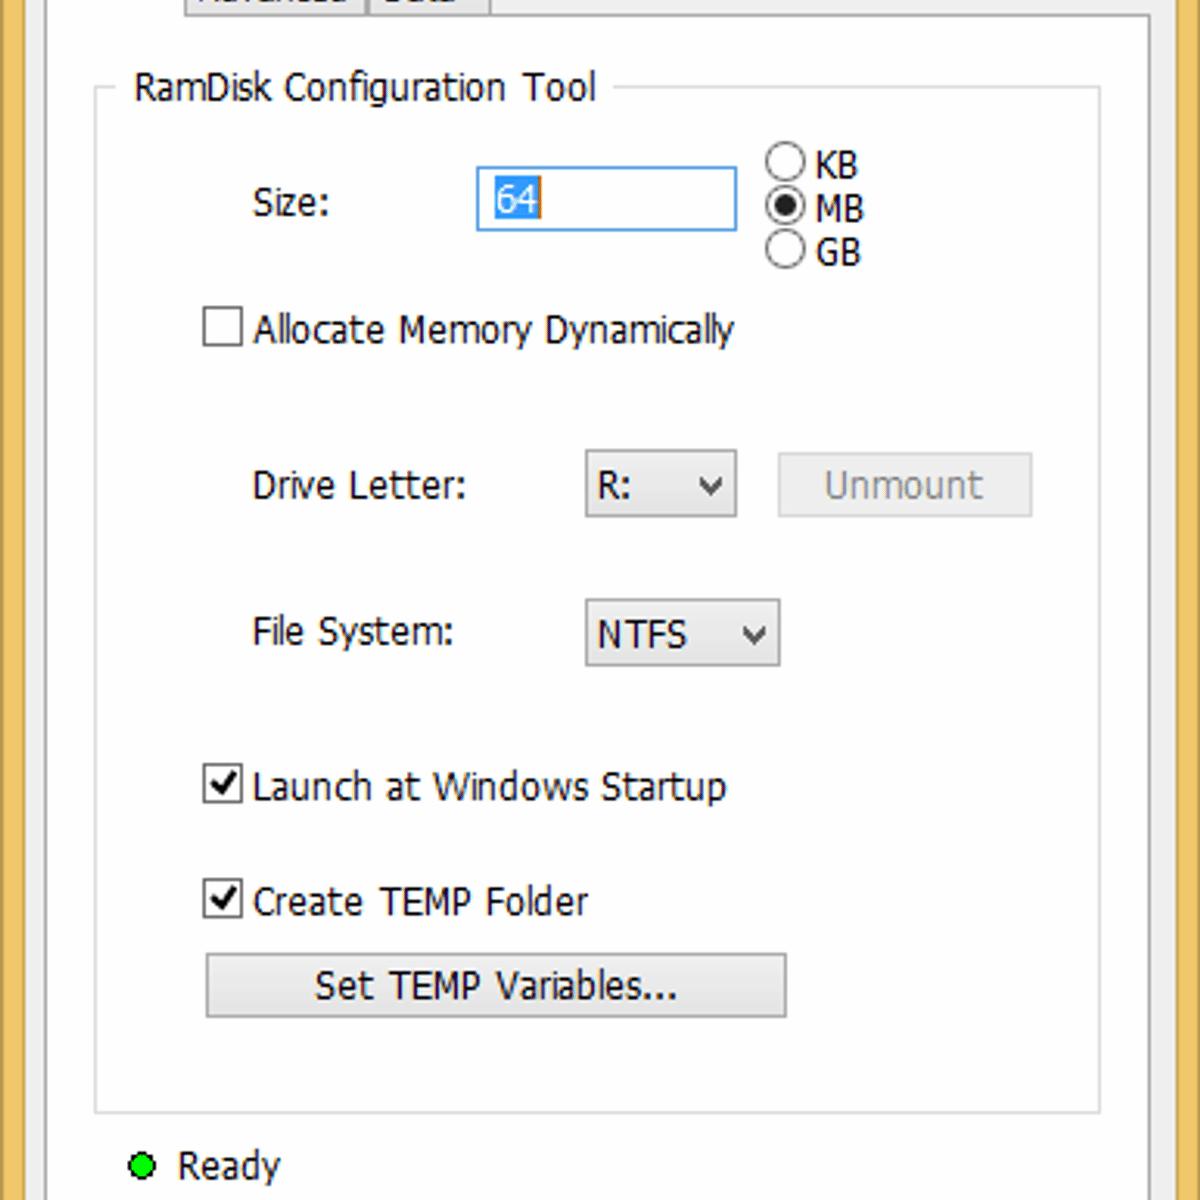 ImDisk Toolkit Alternatives and Similar Software